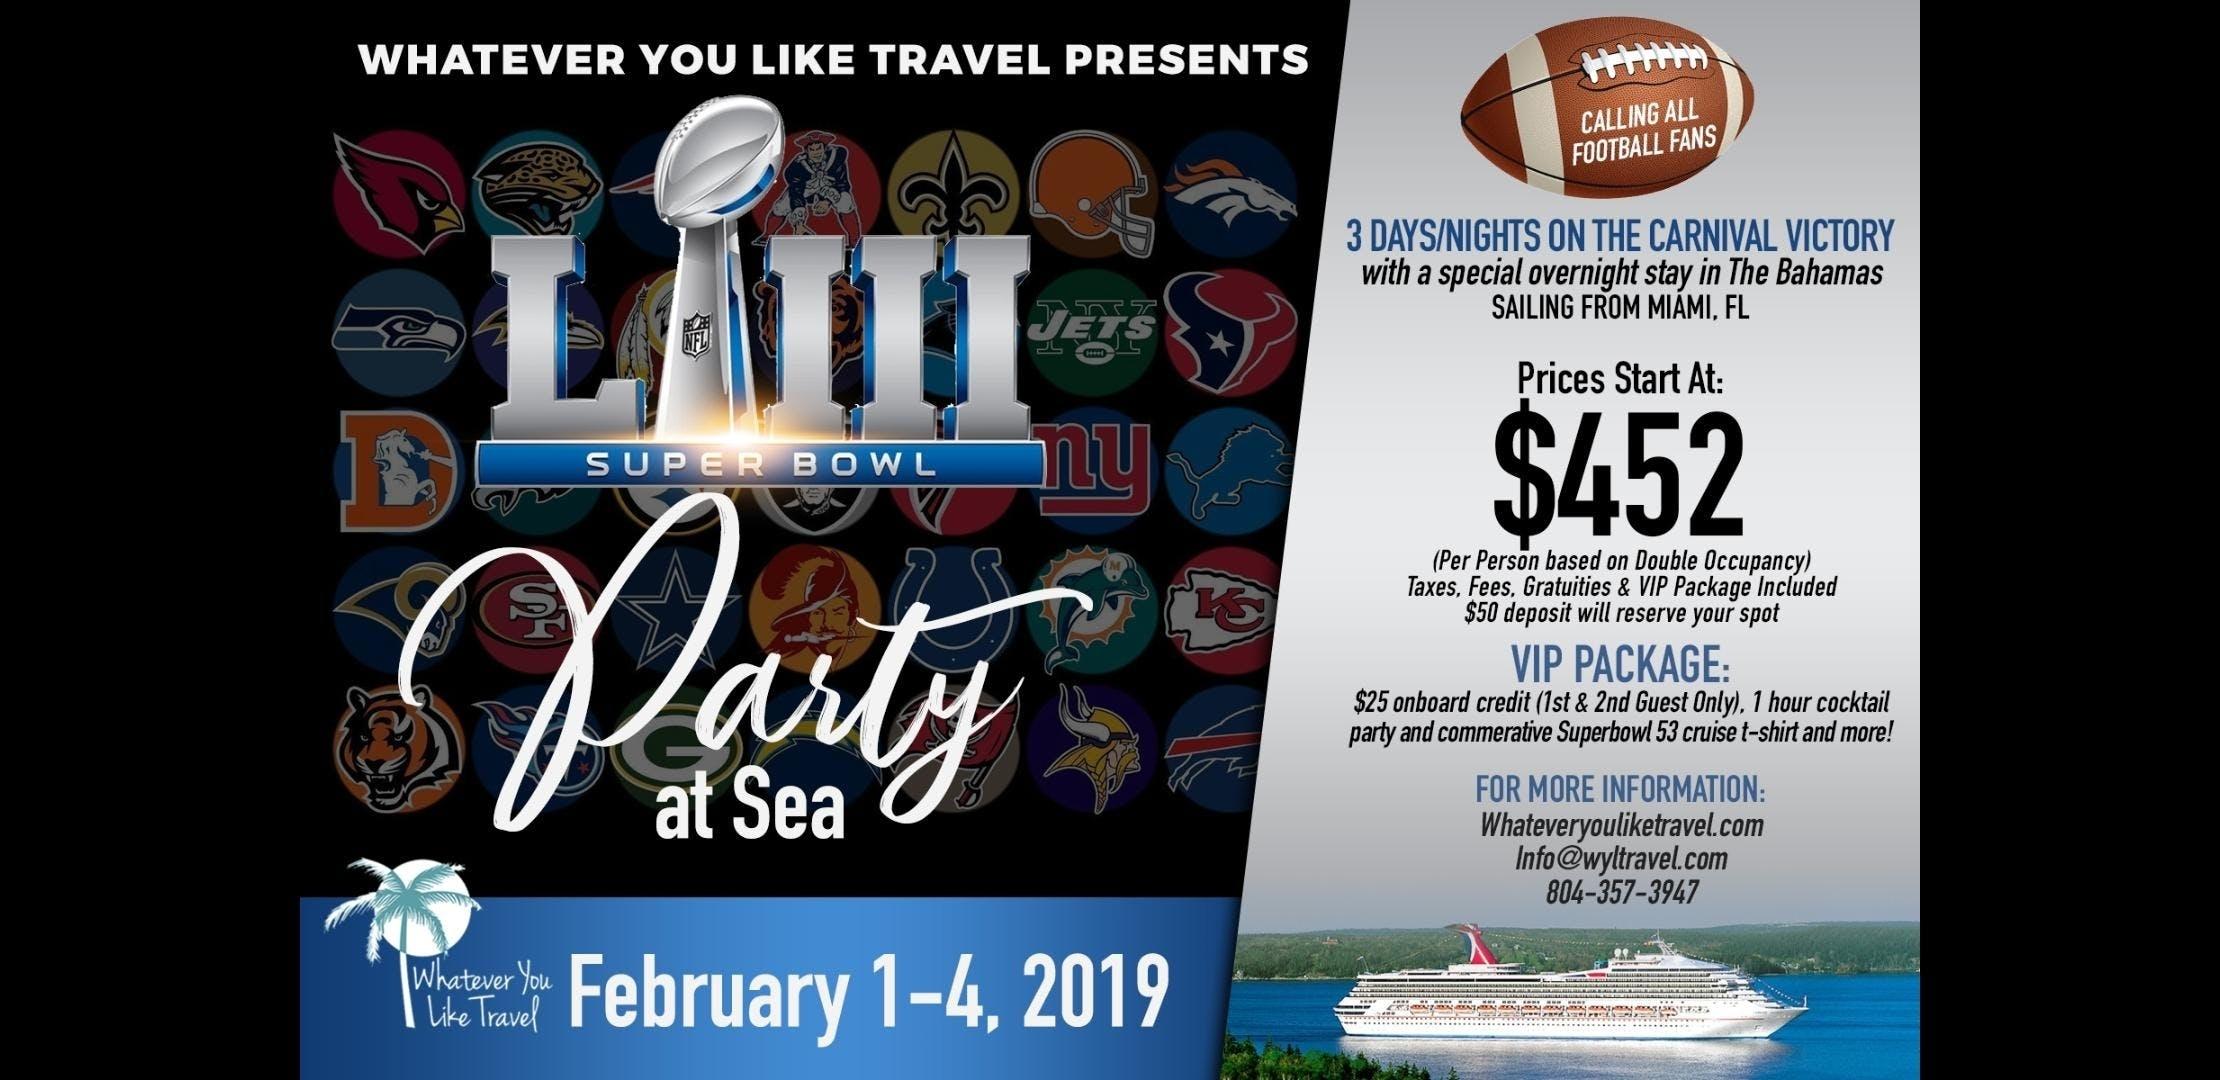 Superbowl Party At Sea, Miami Fl - Feb 1, 2019 - 4:00 Pm with Miami Super Bowl Cruise